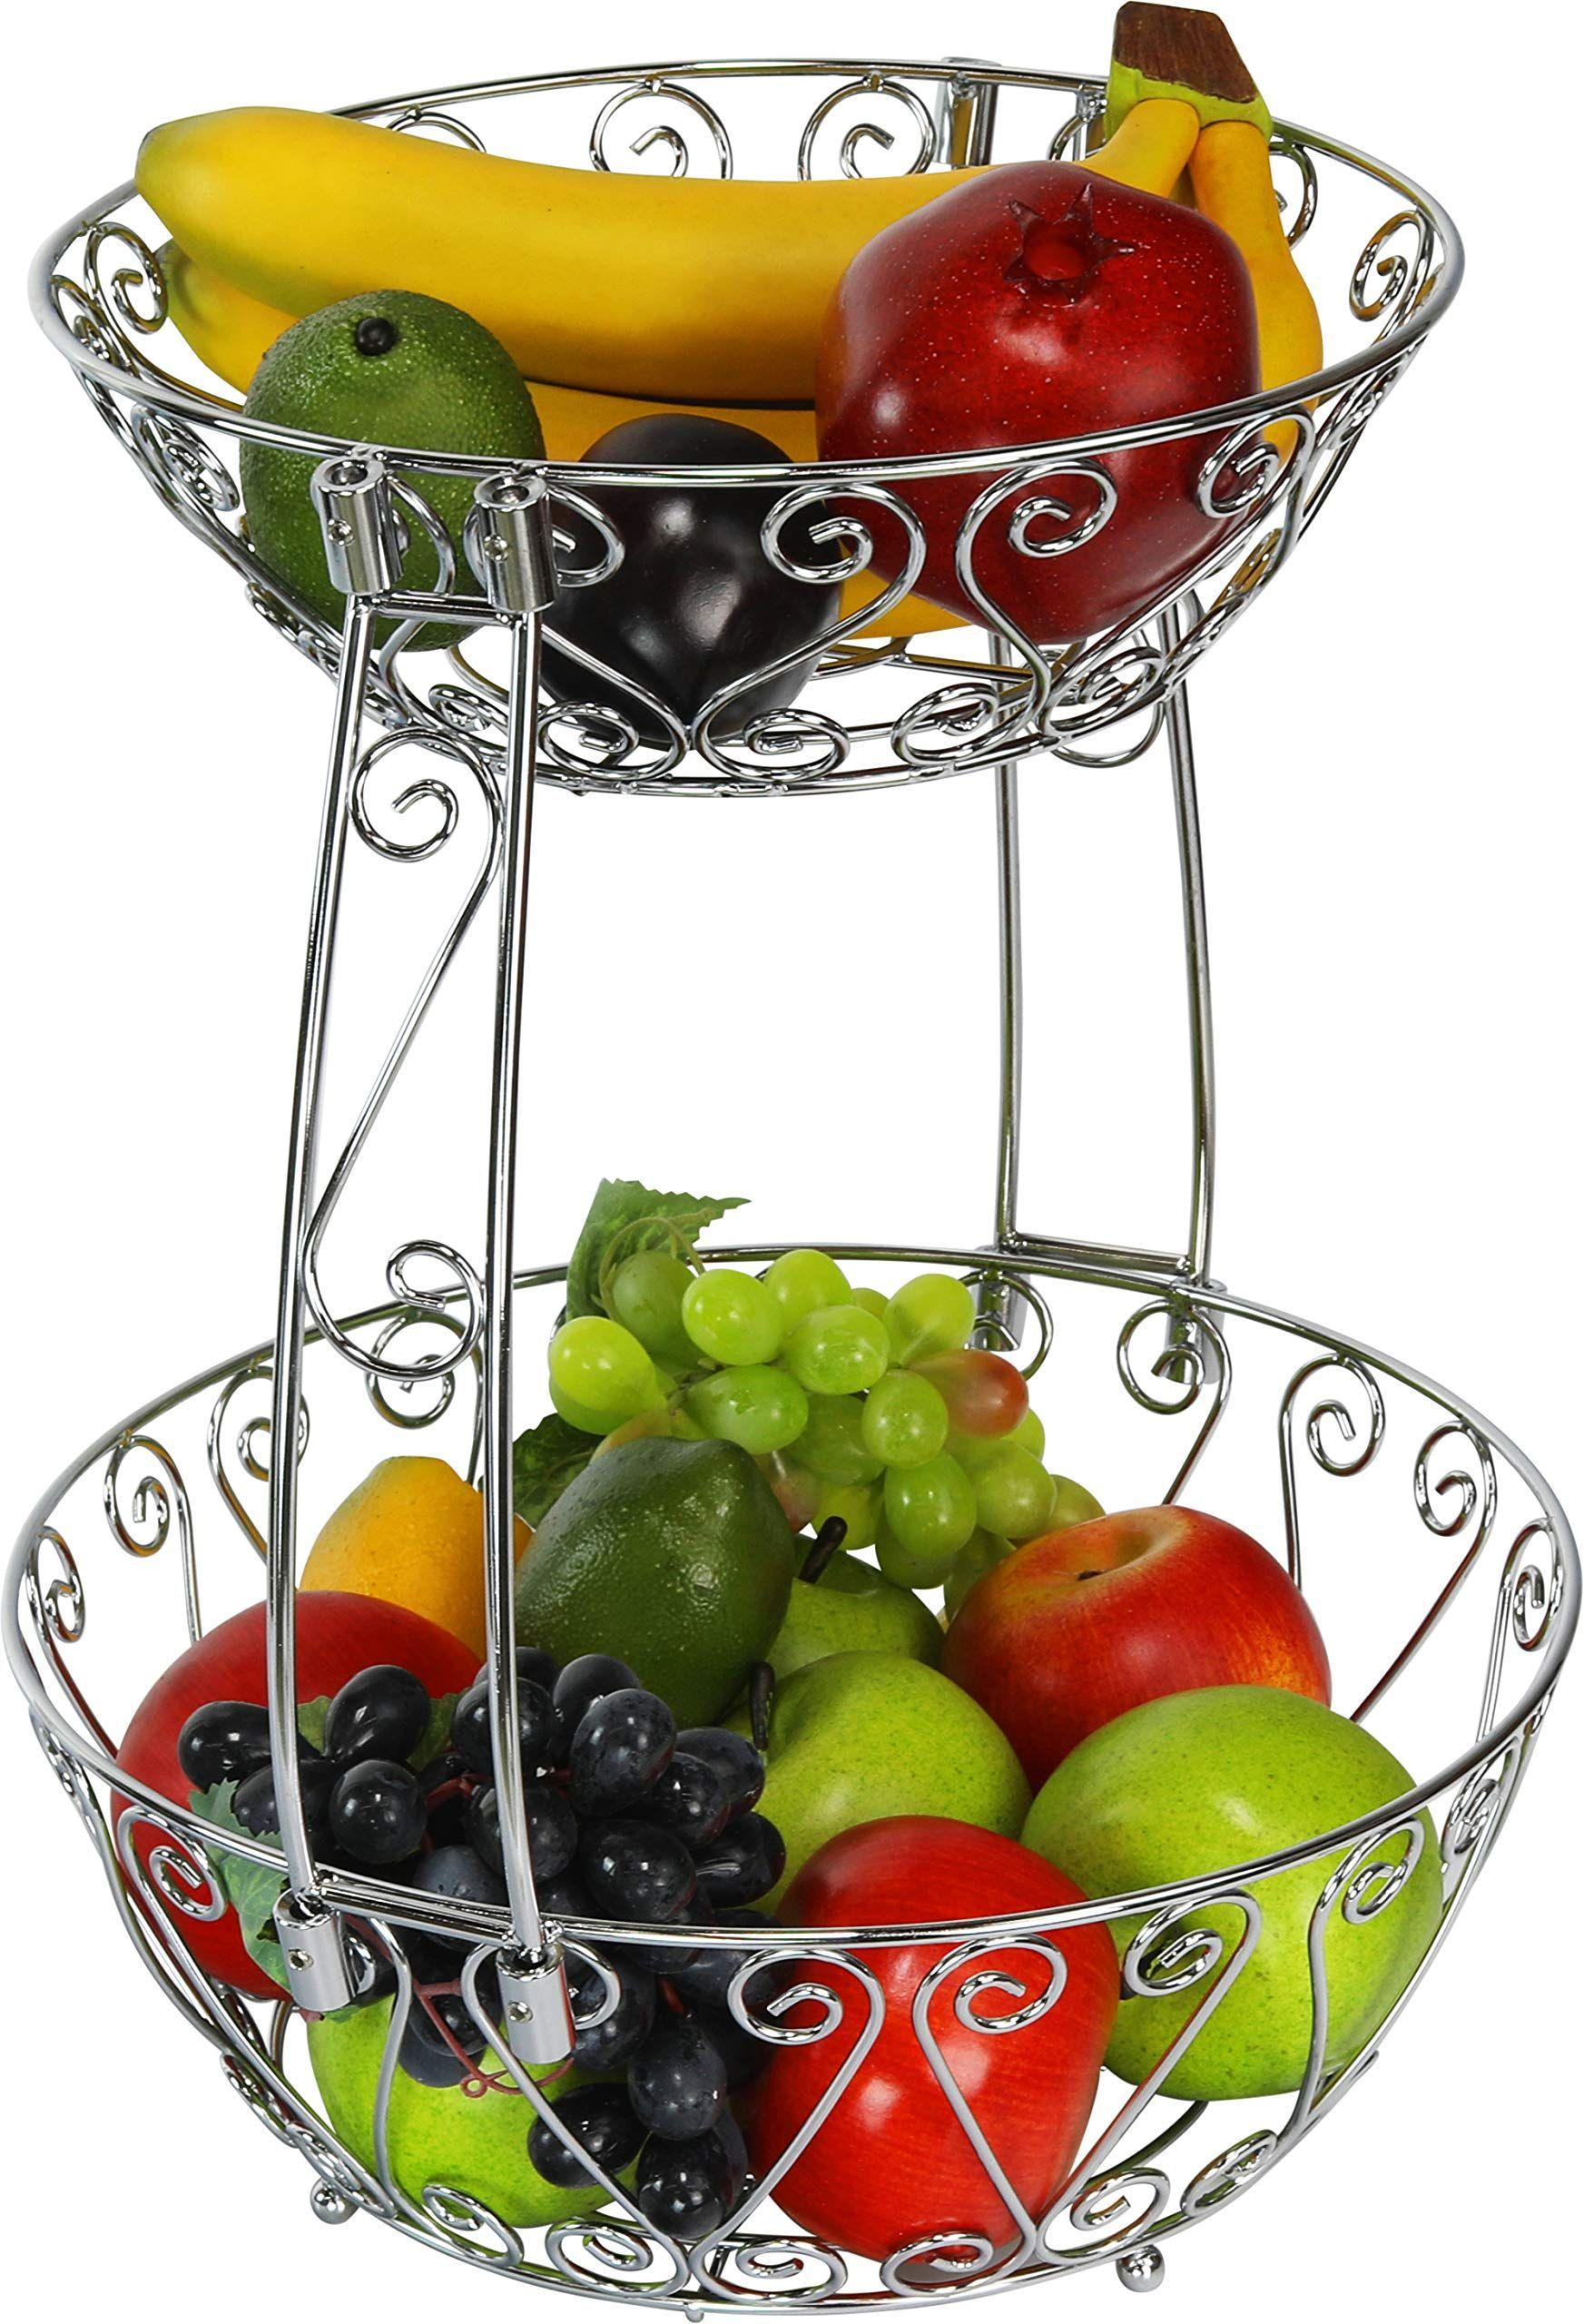 2 Tier Countertop Fruit Basket Bowl Storage Chrome Kitchen